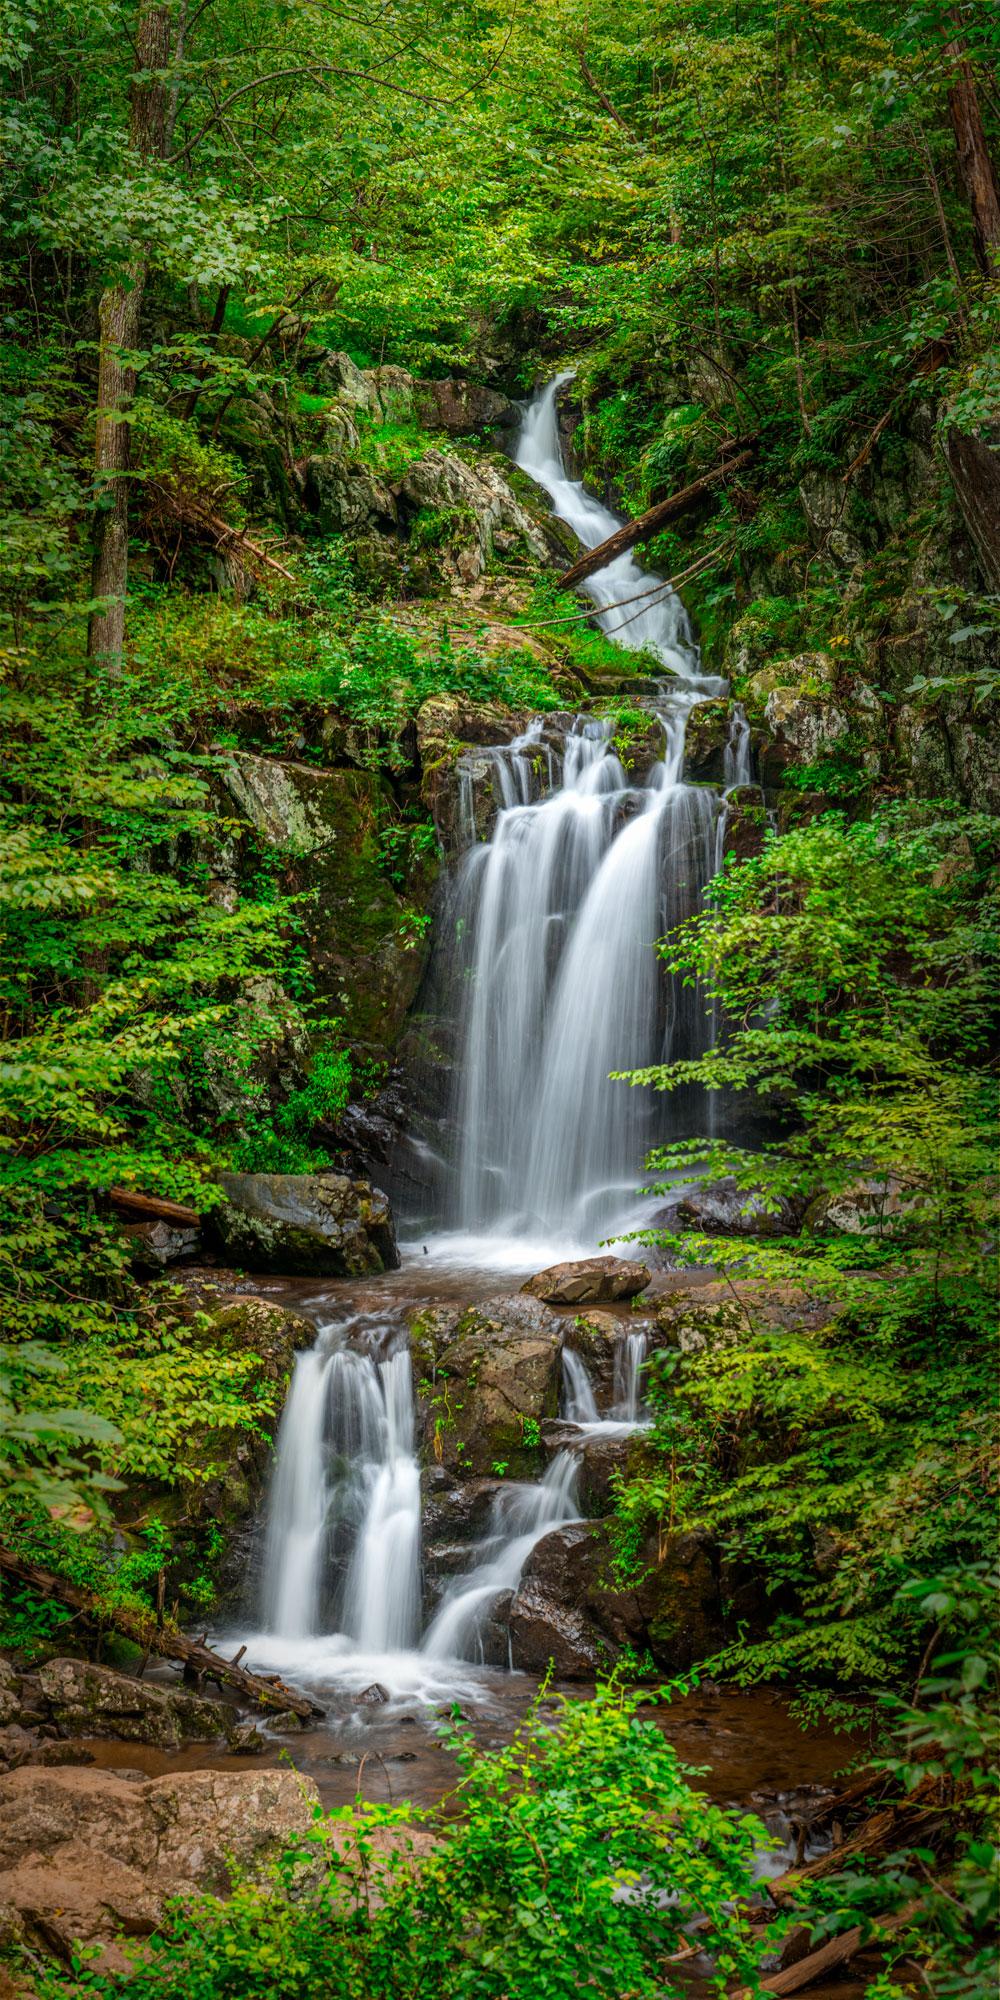 Chirieleison, MIke-Doyles River Falls